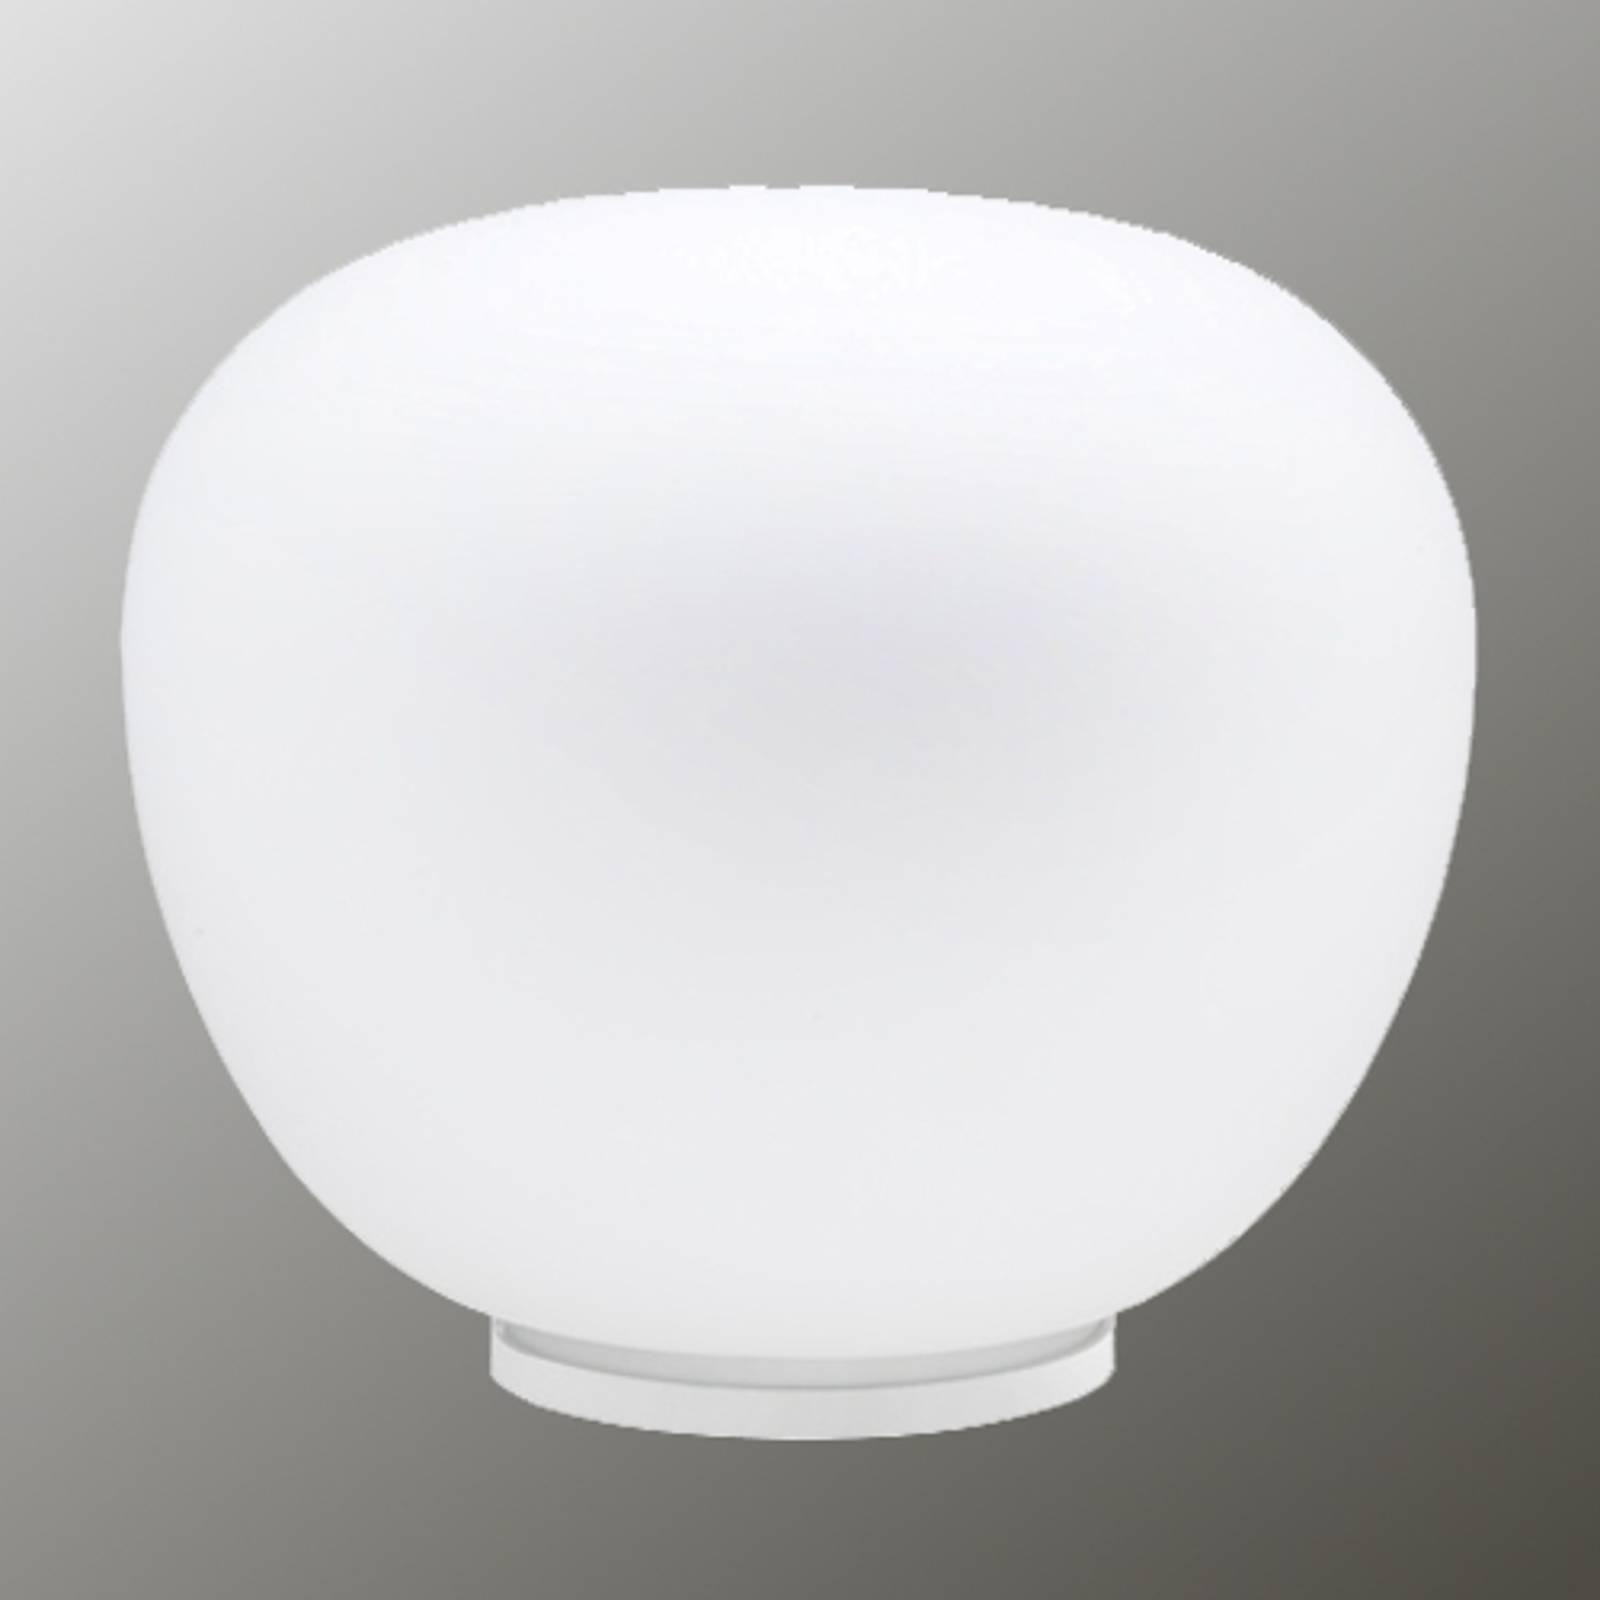 Fabbian Lumi Mochi -pöytälamppu, Ø 38 cm